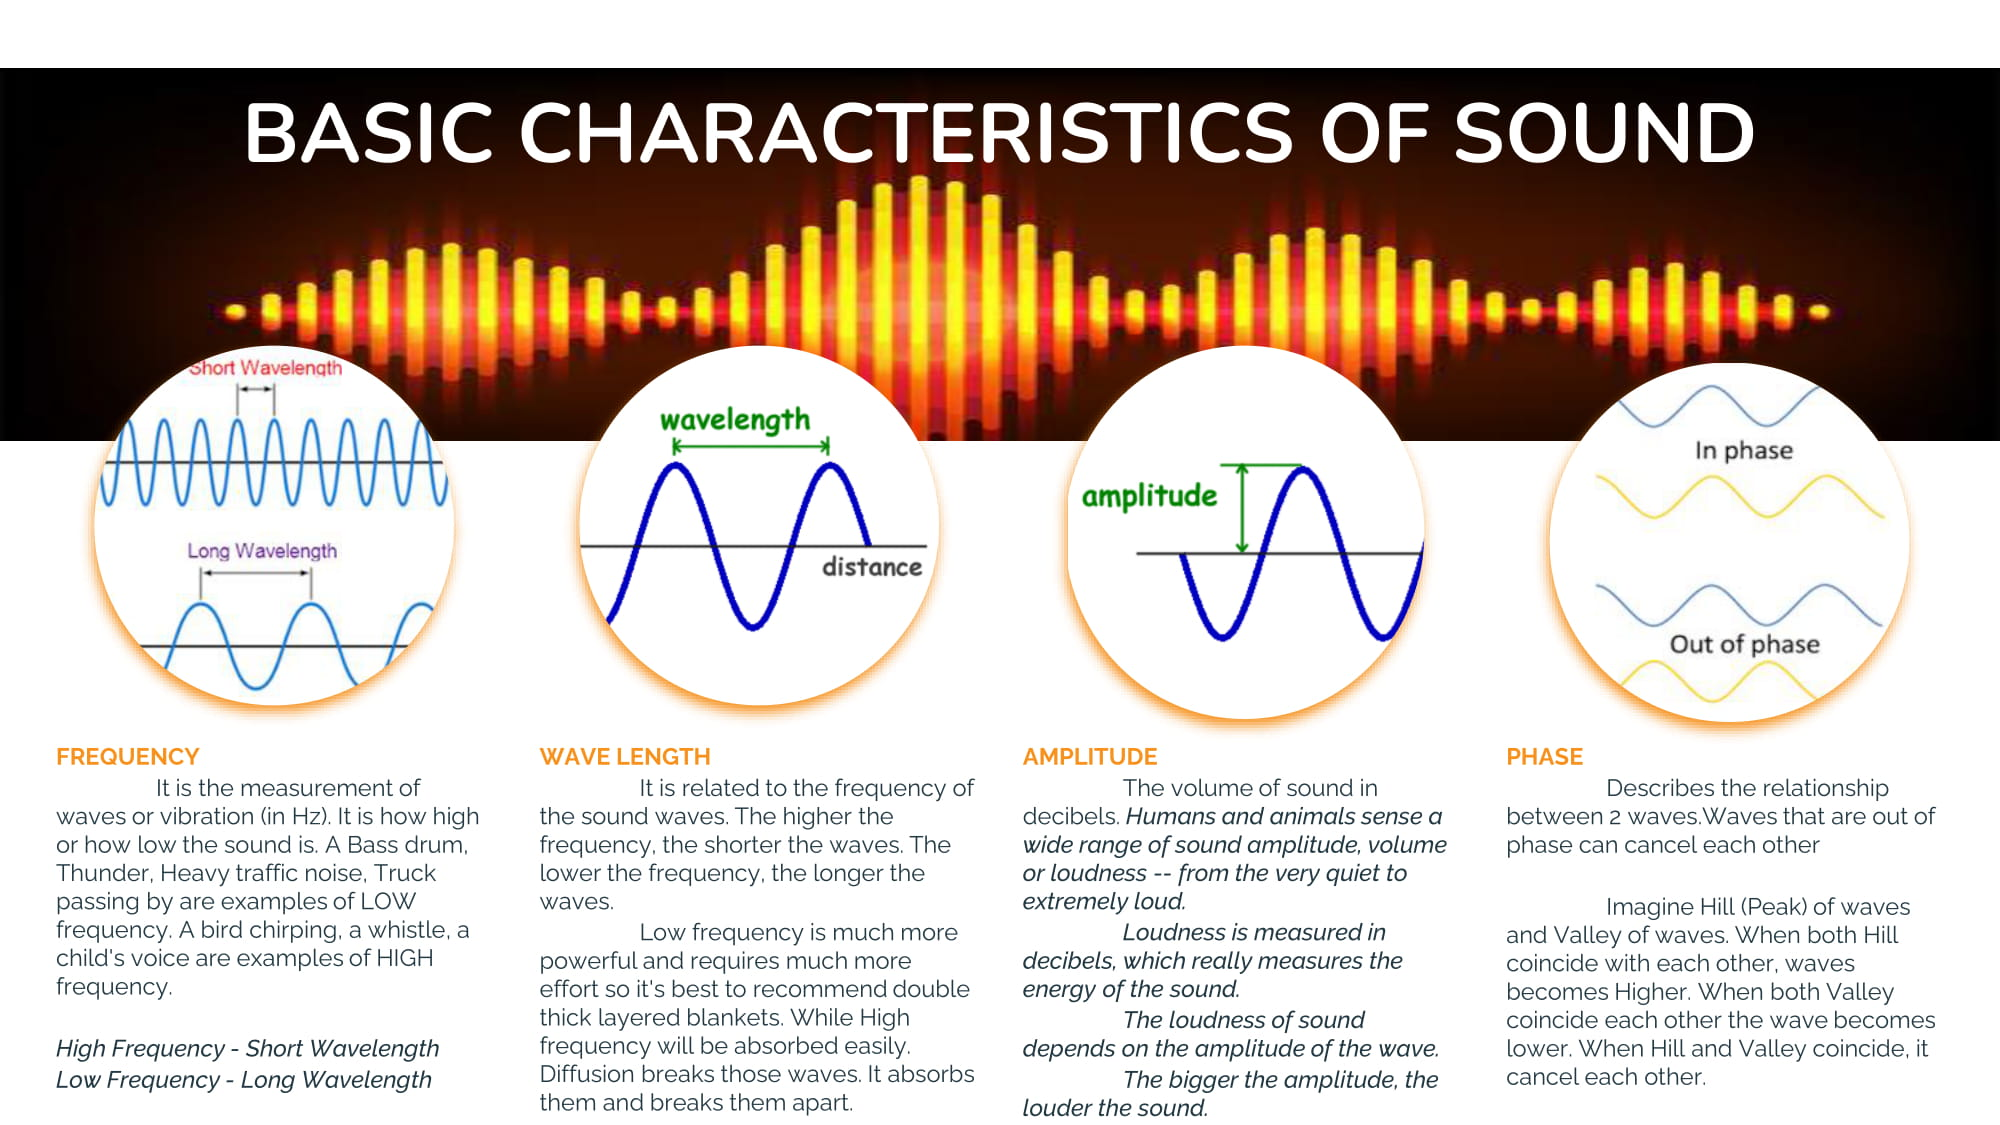 BASIC CHARACTERISTICS OF SOUND